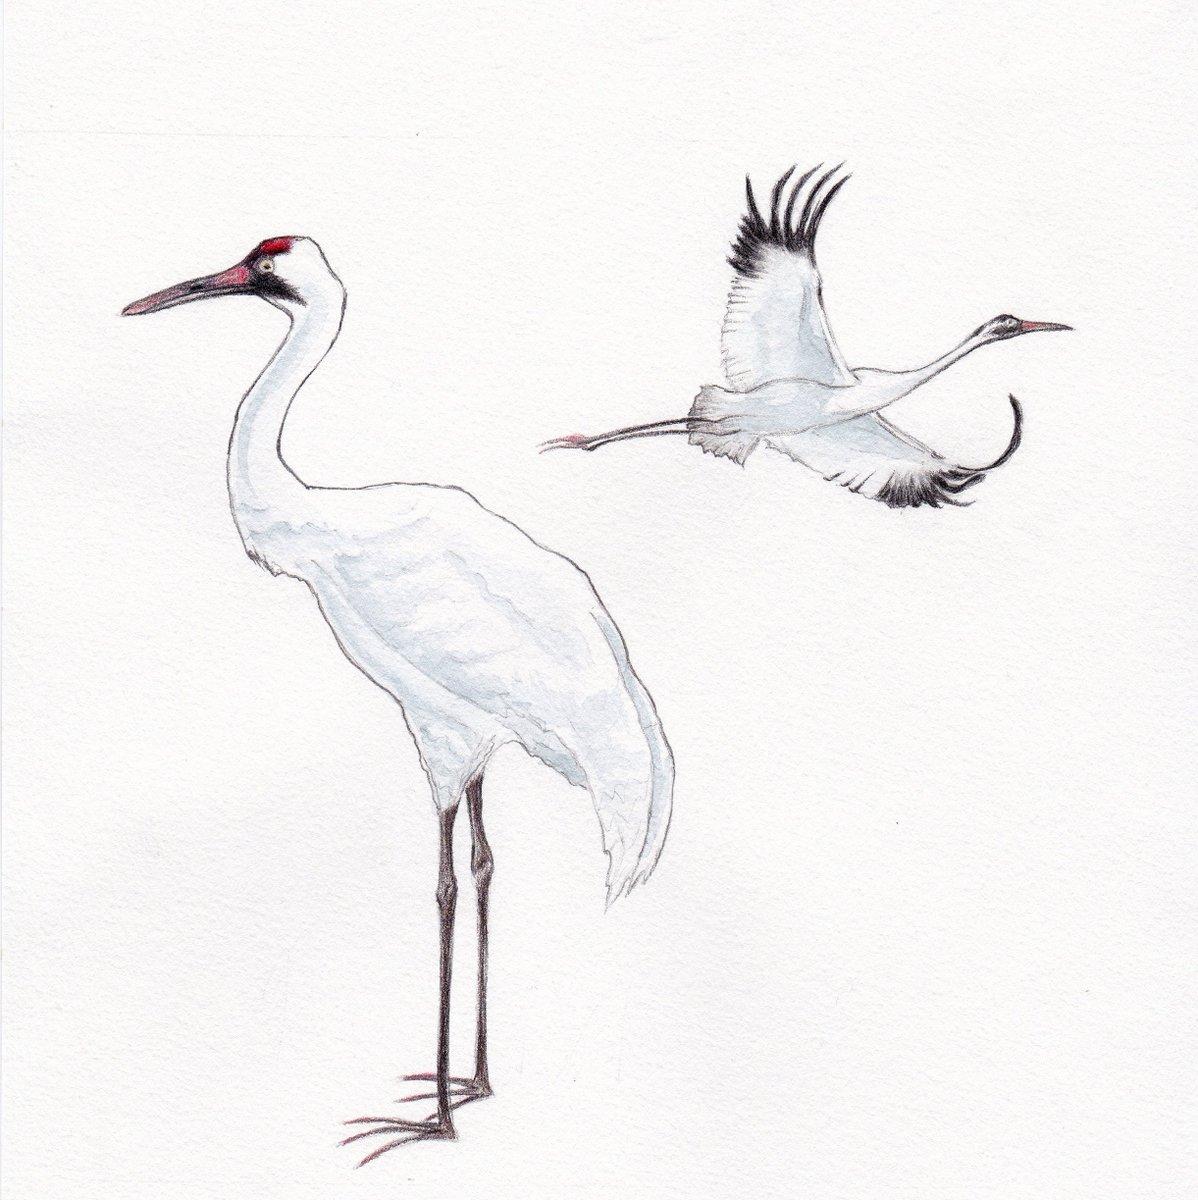 @AnimalAlphabets #Animalalphabets W is for Whooping Crane!  #whoopingcrane #crane #bird #illustration  #pencil #watercolour #watercolor<br>http://pic.twitter.com/PU9erAH77e